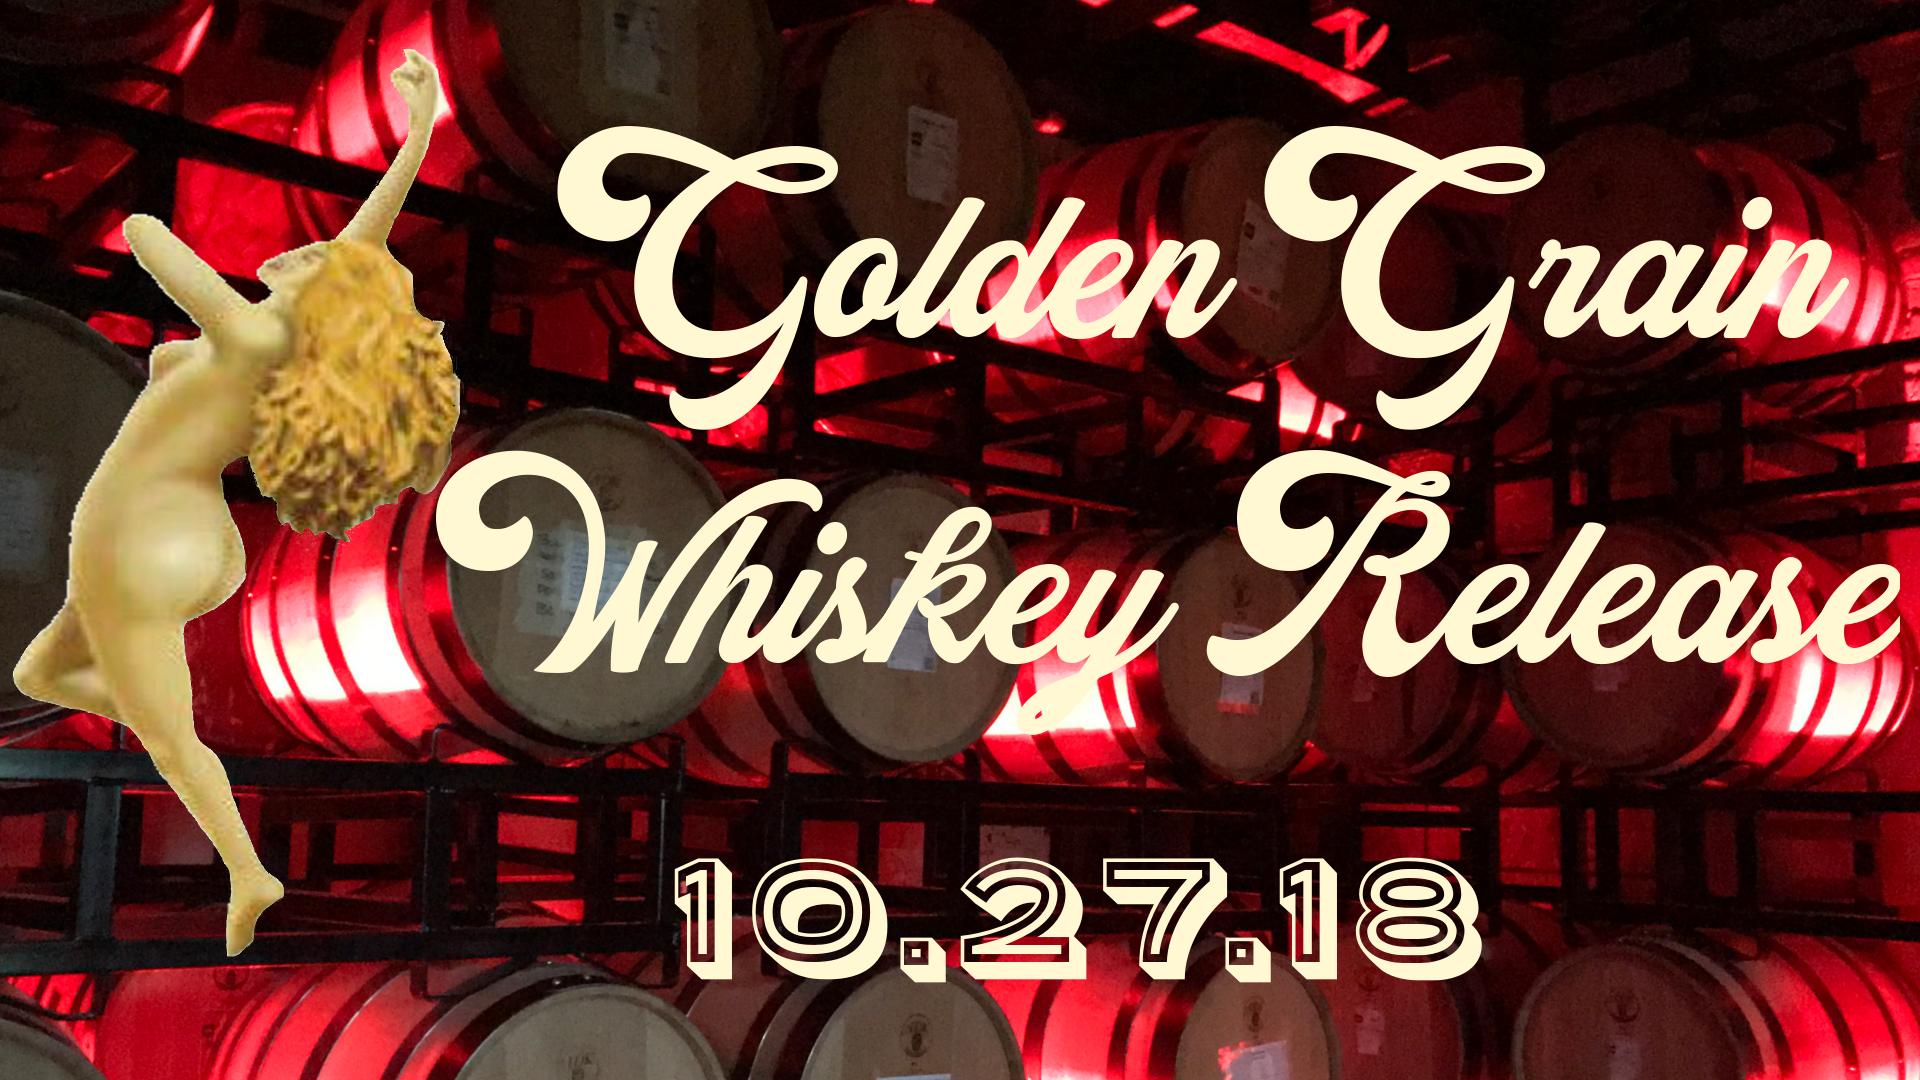 golden grain event poster.png